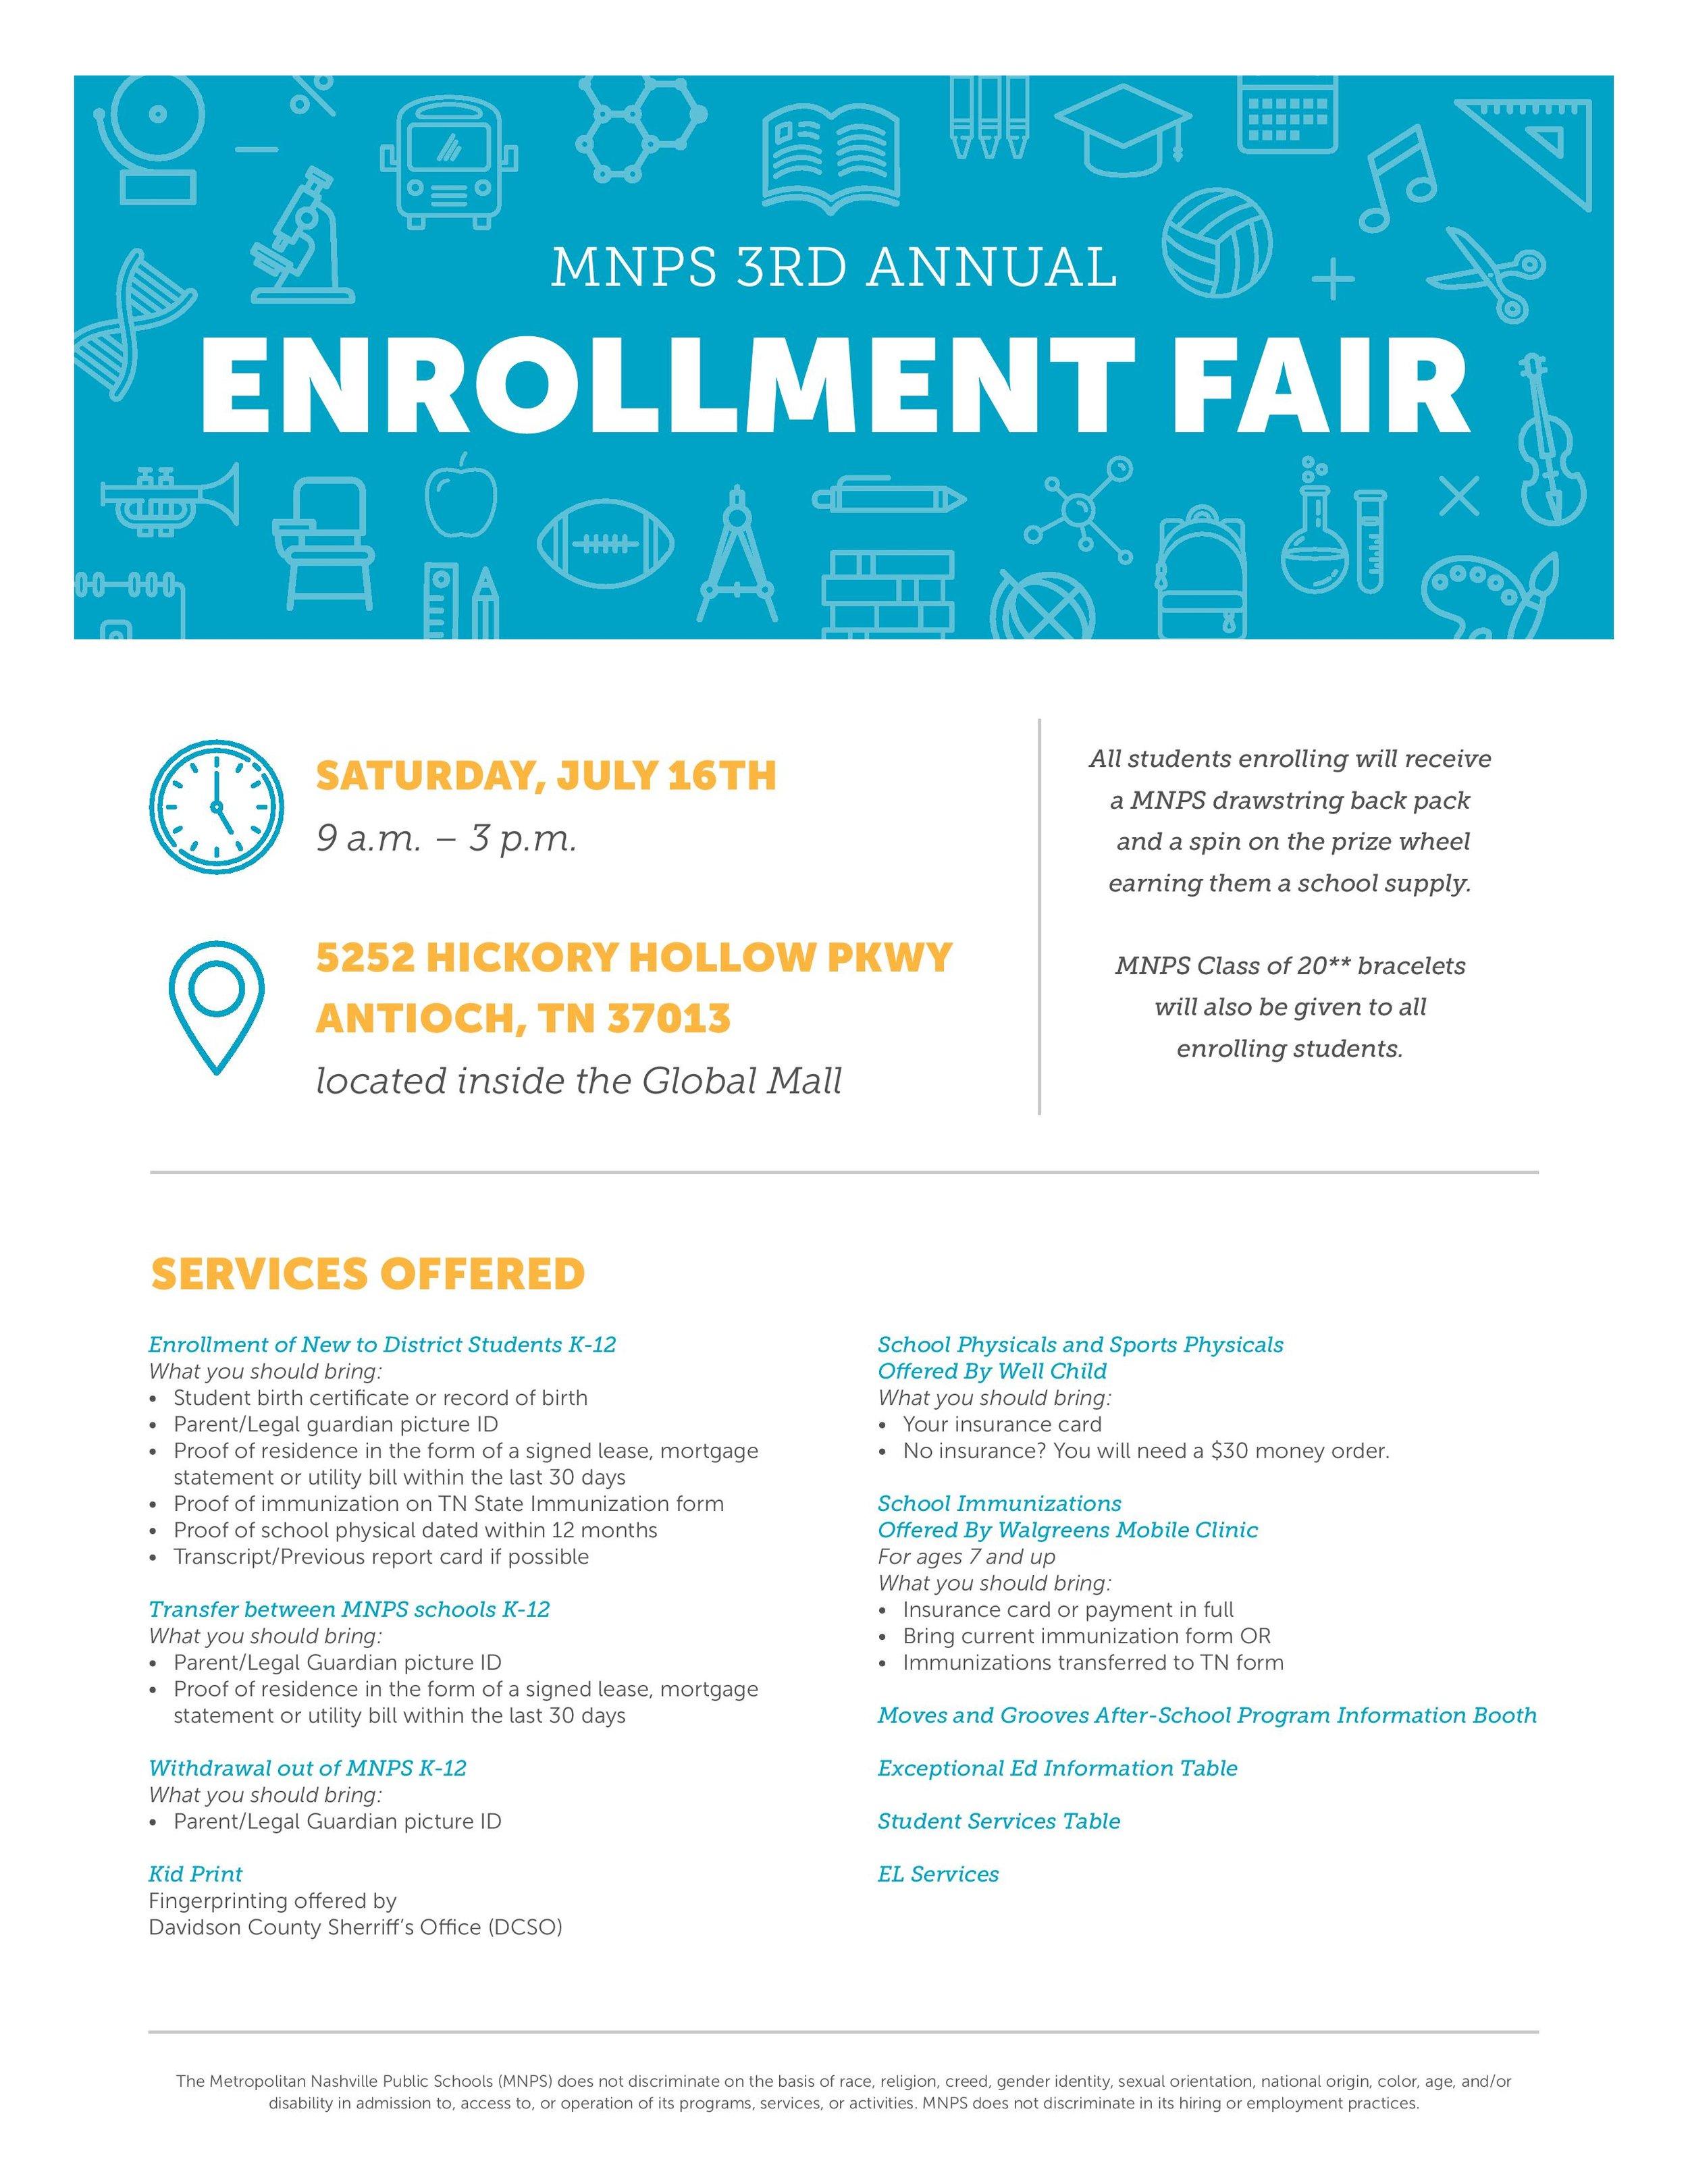 2016-17_EnrollmentFair_Flyer-page-001.jpg